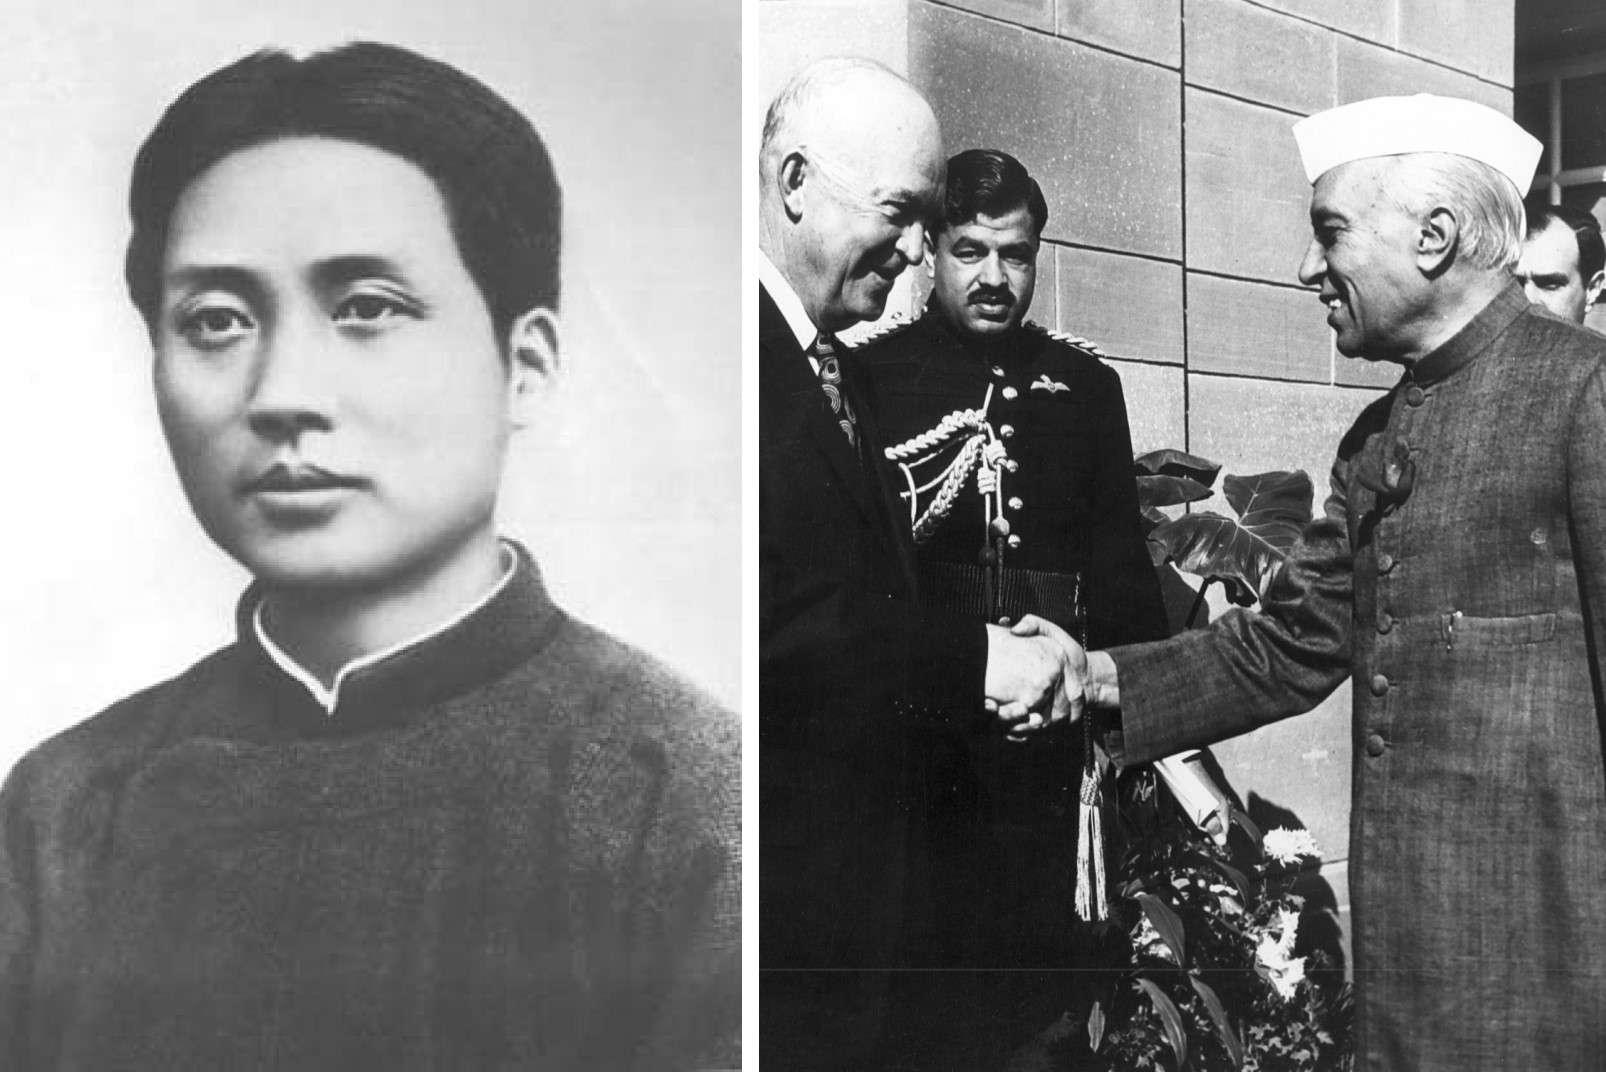 Mao Tse Tung and Jawaharlal Nehru